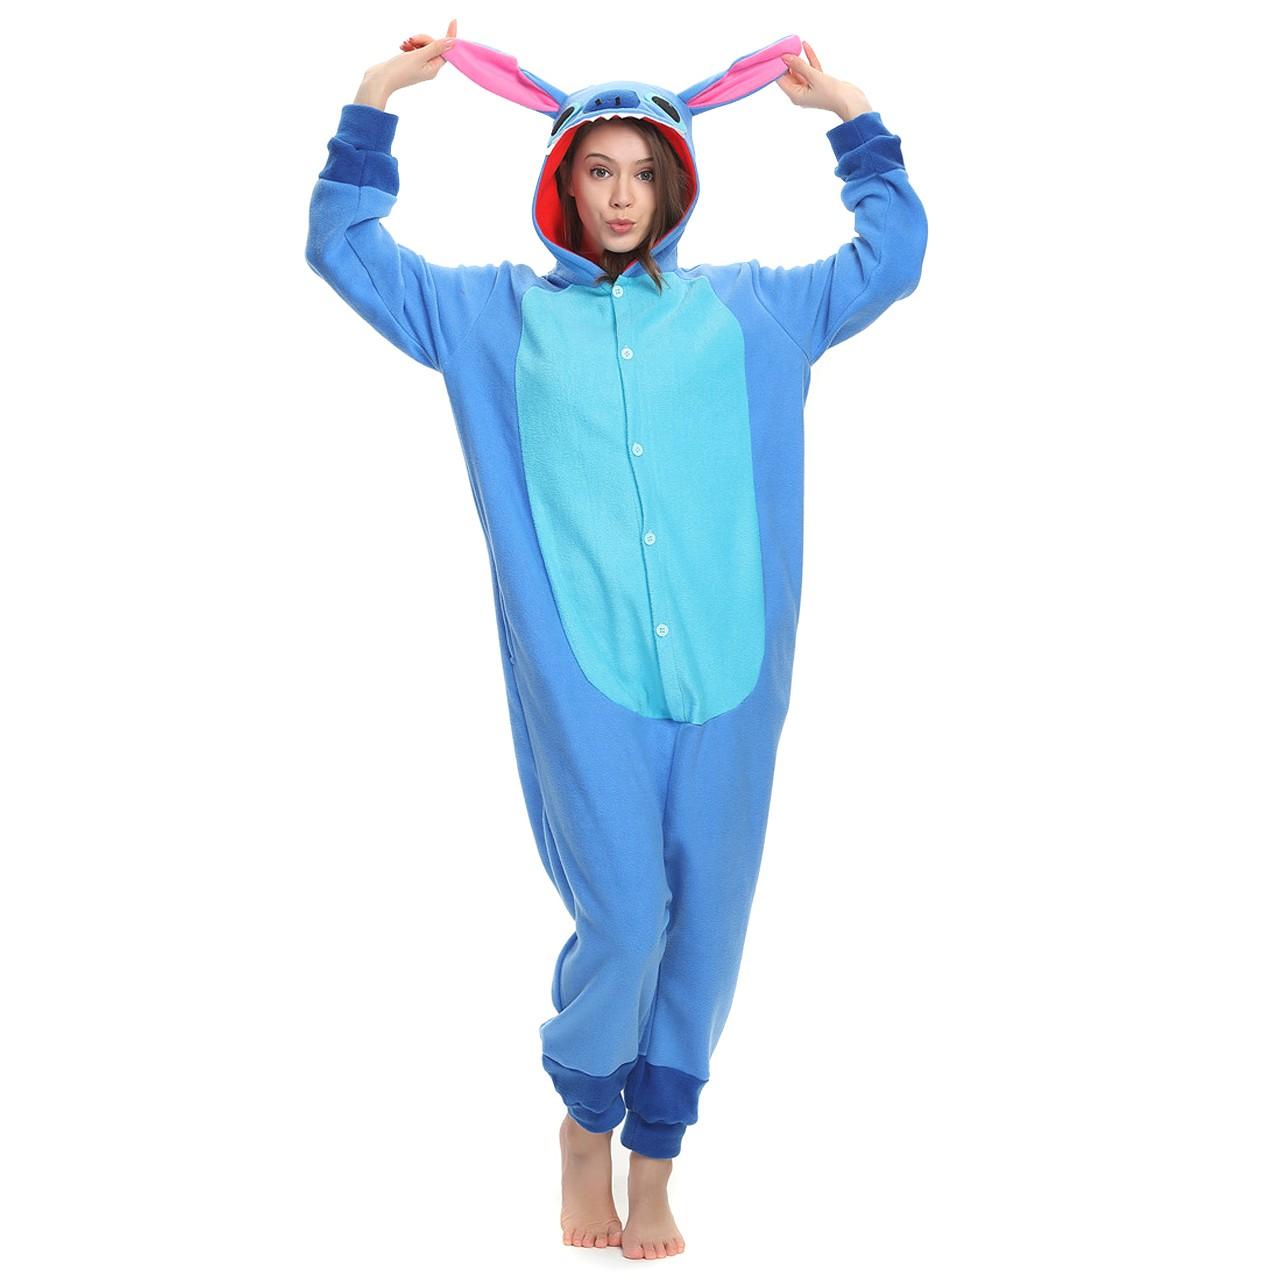 082806efdf3e Stitch Onesie for Adult Kigurumi Pajama Disney Lilo   Stitch Costumes